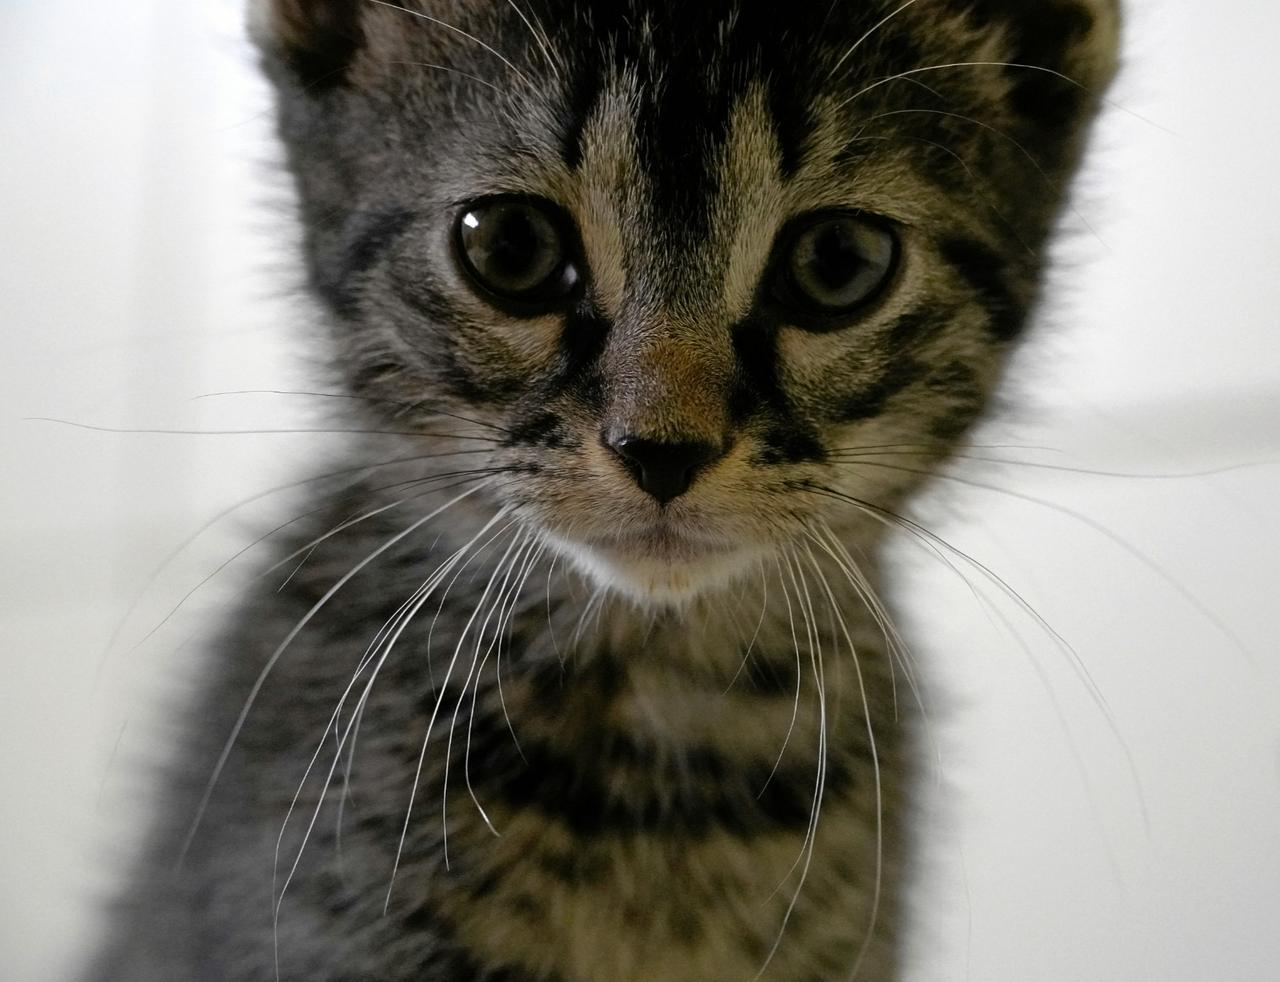 Immer mehr kranke Katzenbabys